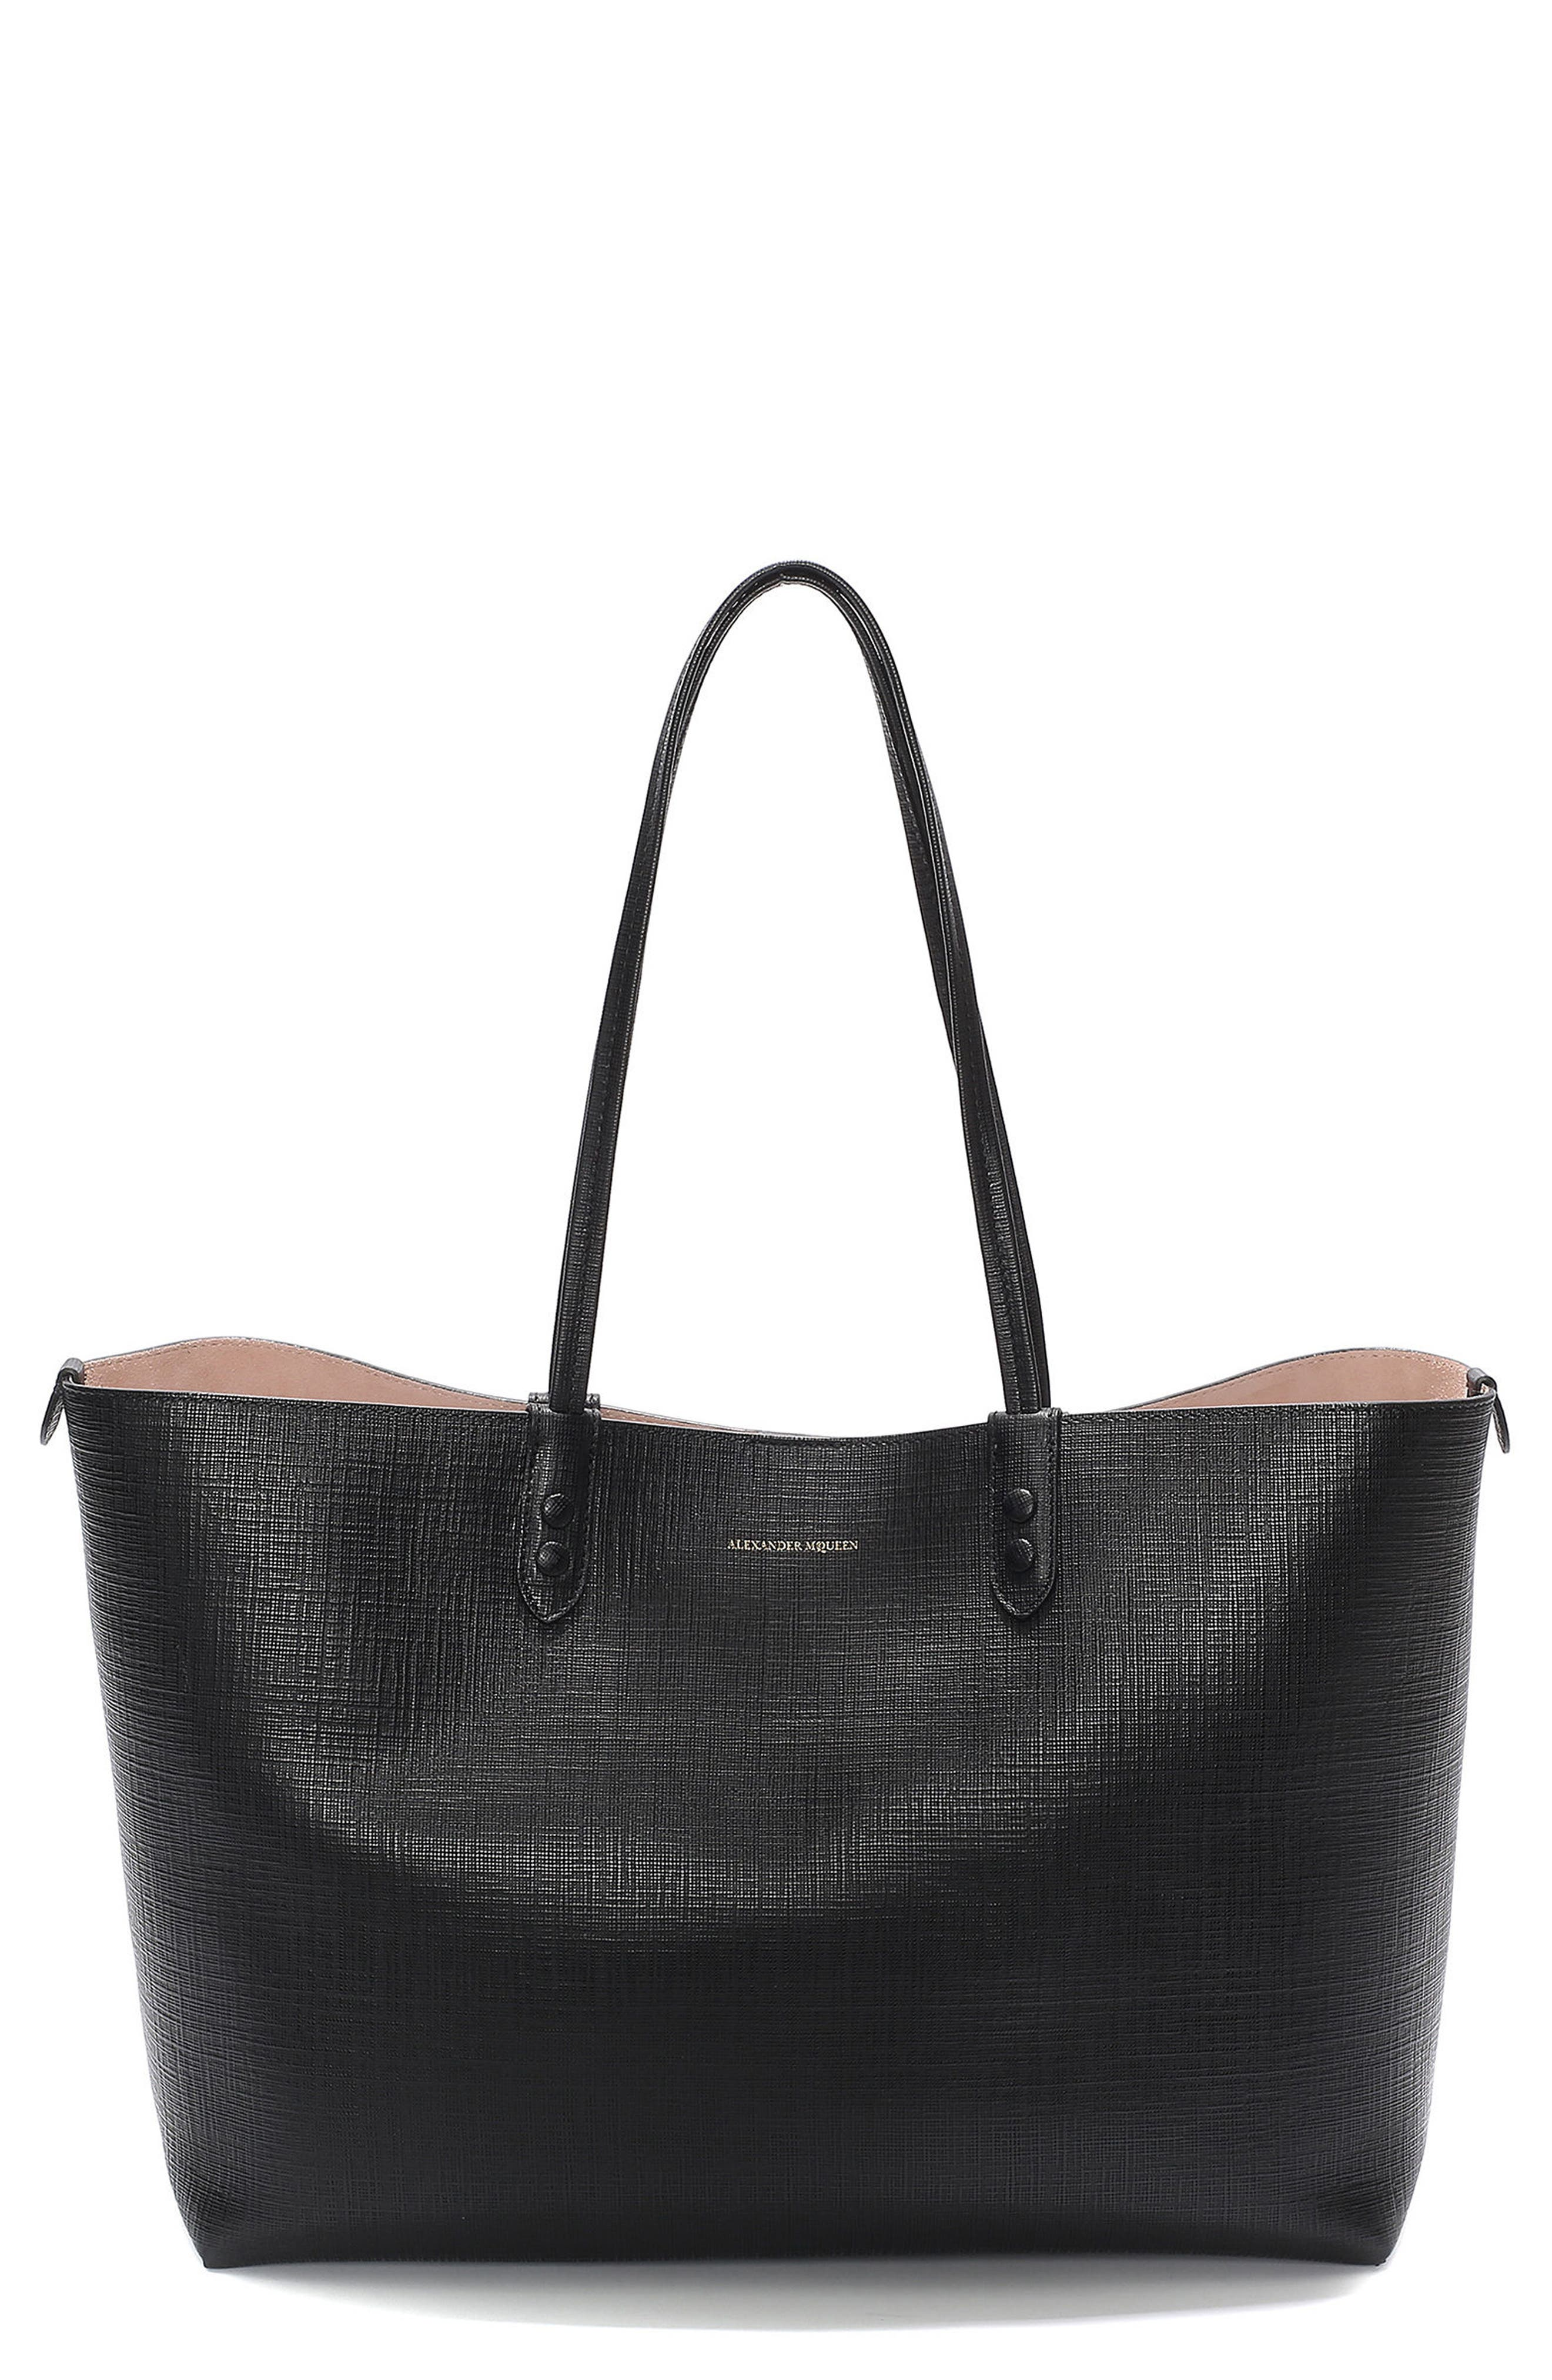 Alexander McQueen Medium Calfksin Leather Shopper